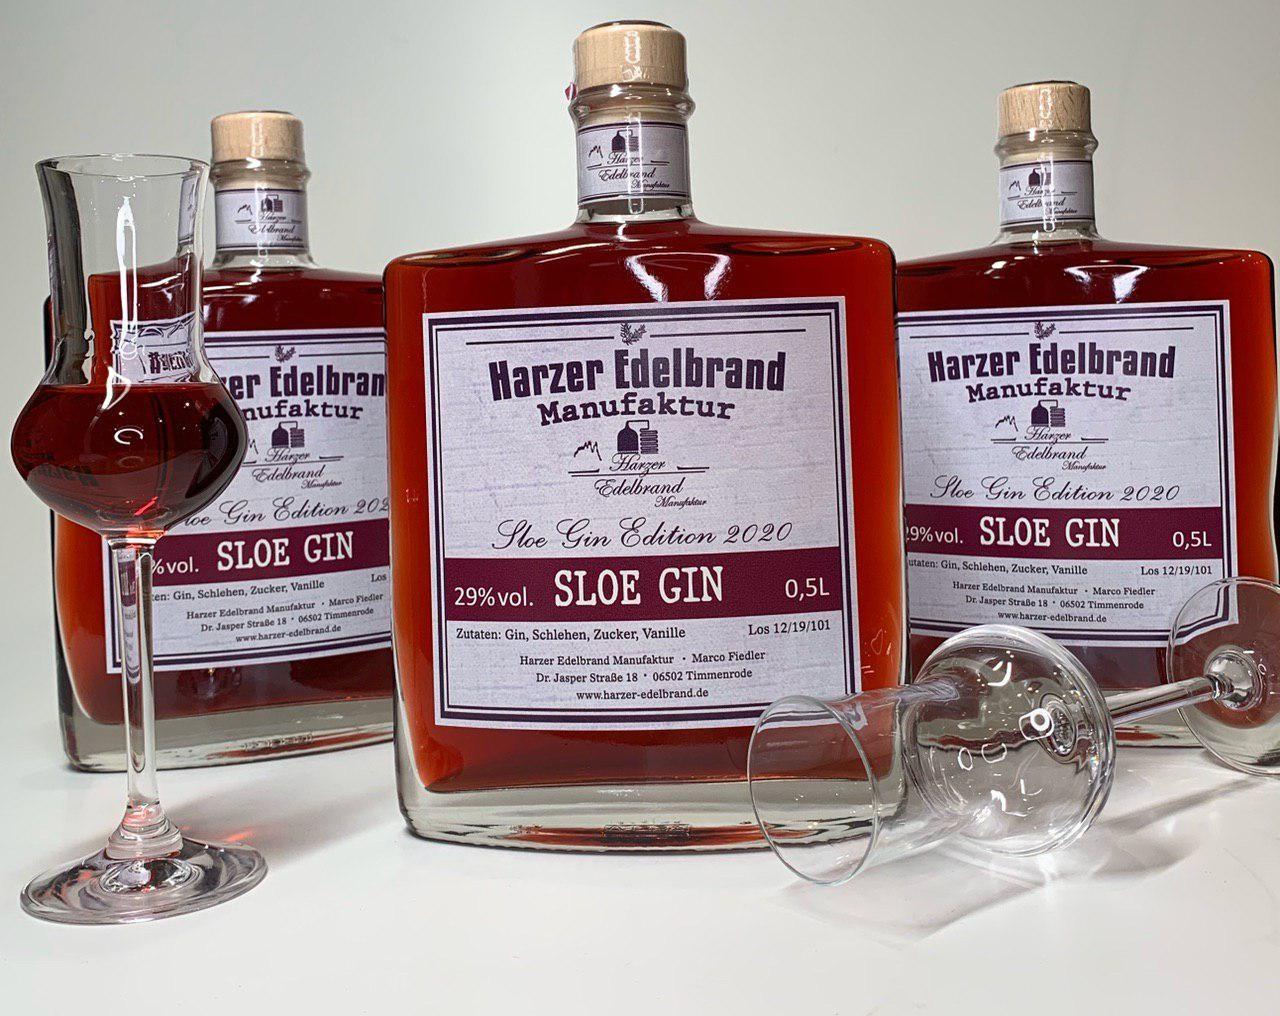 Harzer-Edelbrand-Manufaktur-SoleGIN.jpg